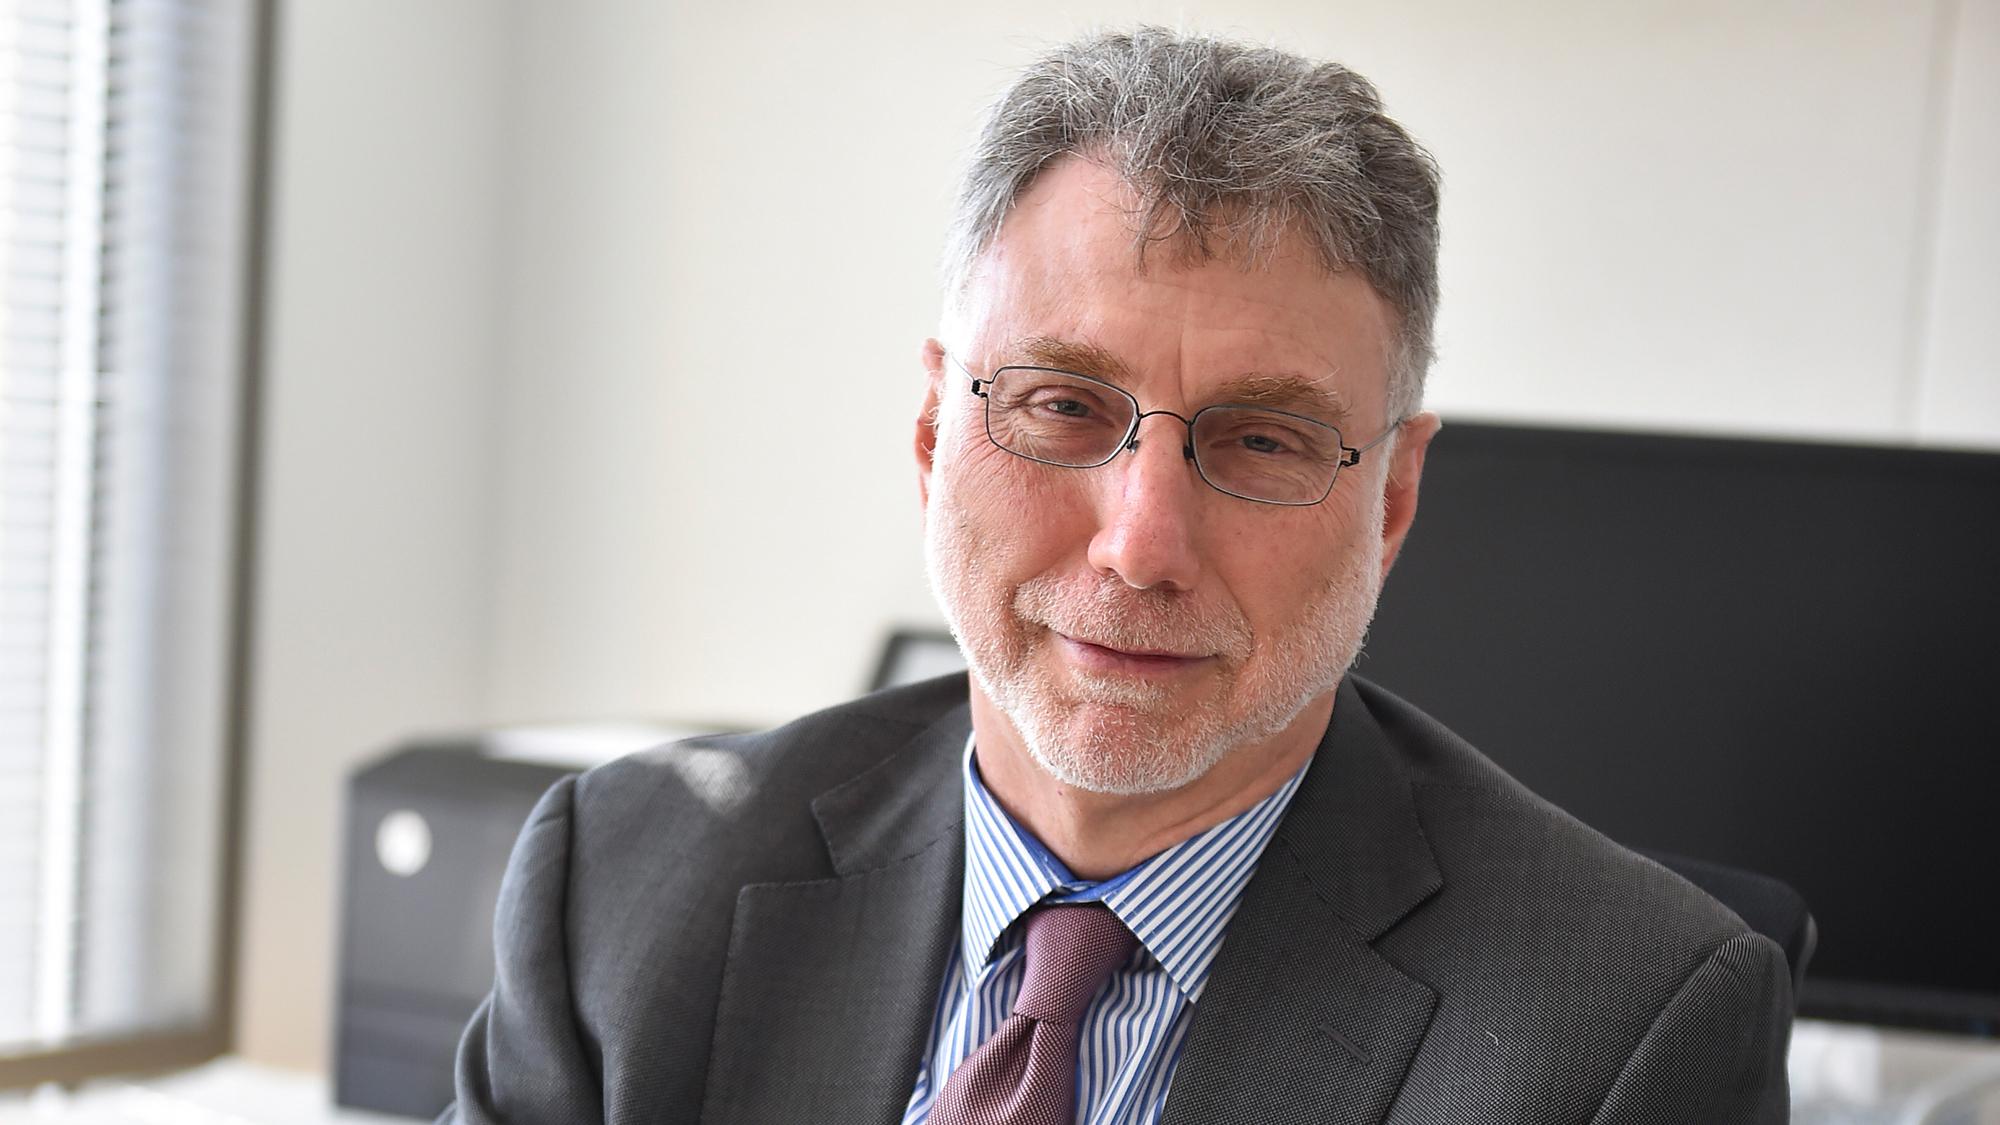 Washington Post editor Marty Baron announces his retirement